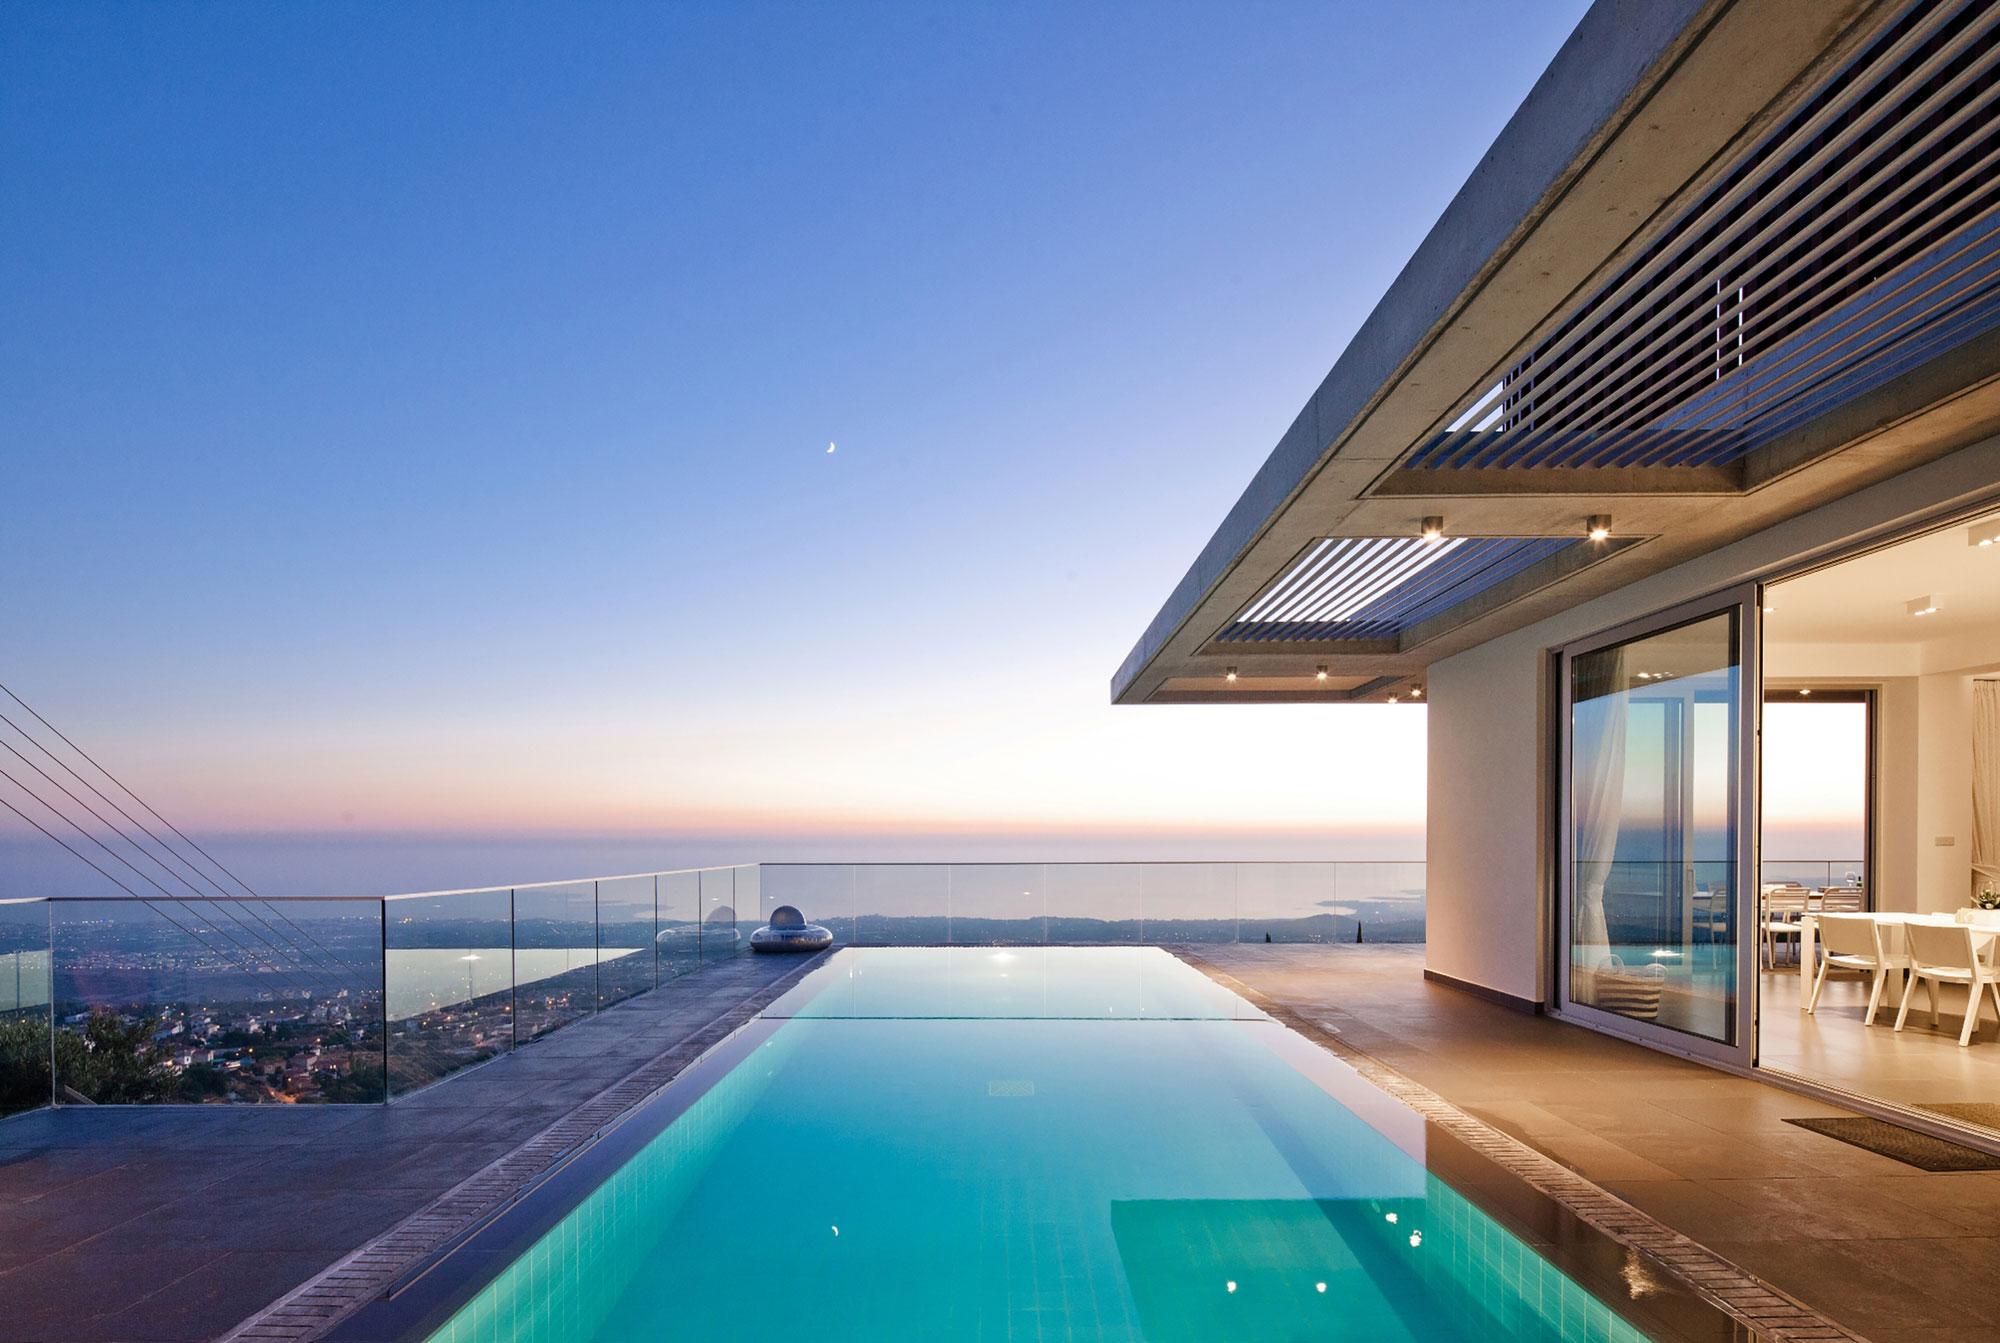 Modern Prodromos and Desi Residence in Paphos by Vardastudio Architects & Designers-16